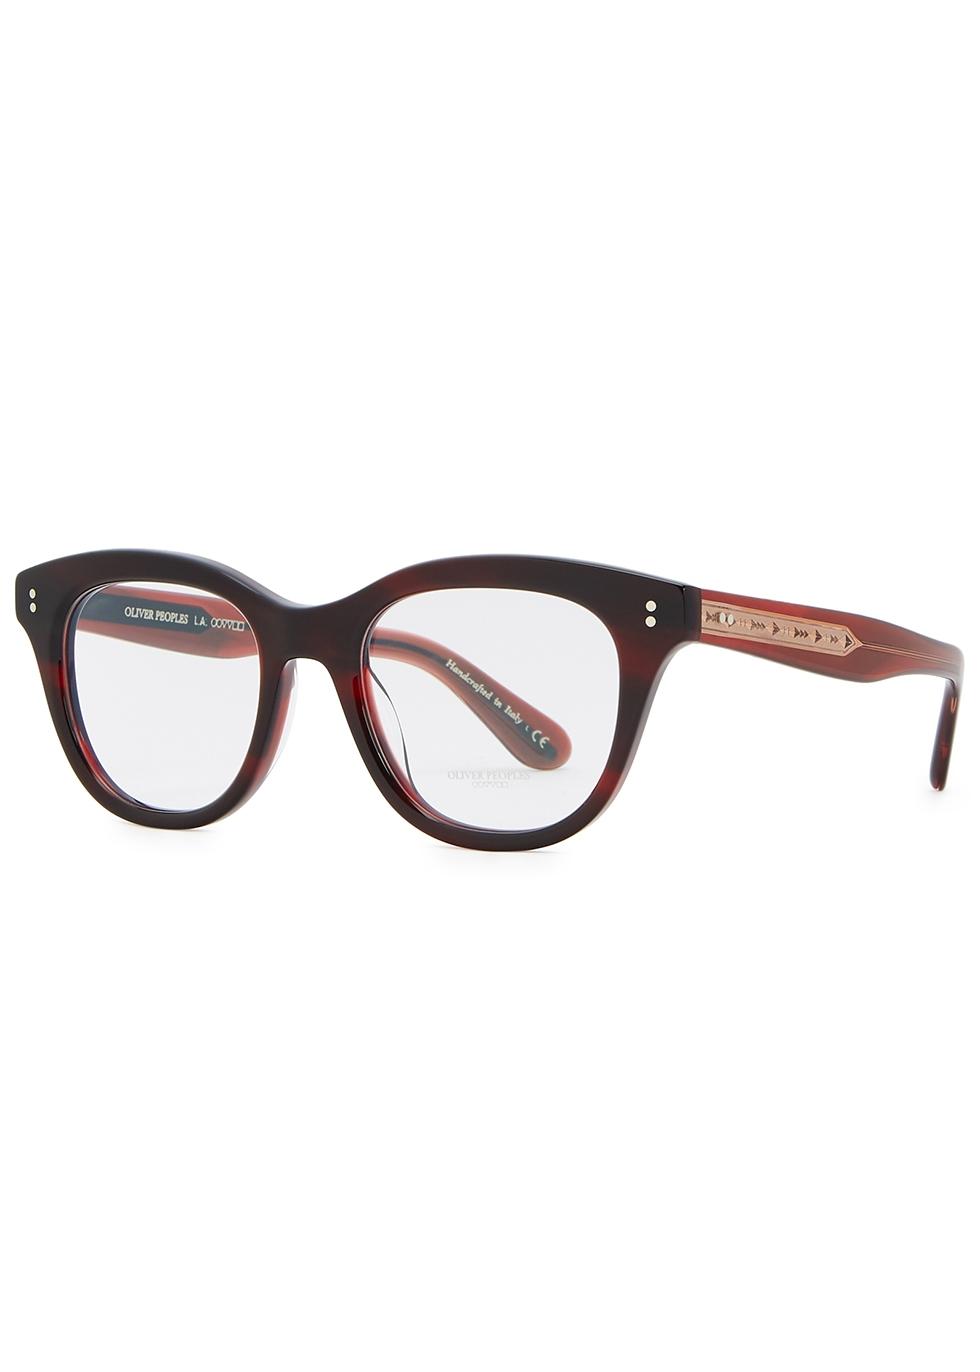 Red wayfarer-style optical glasses